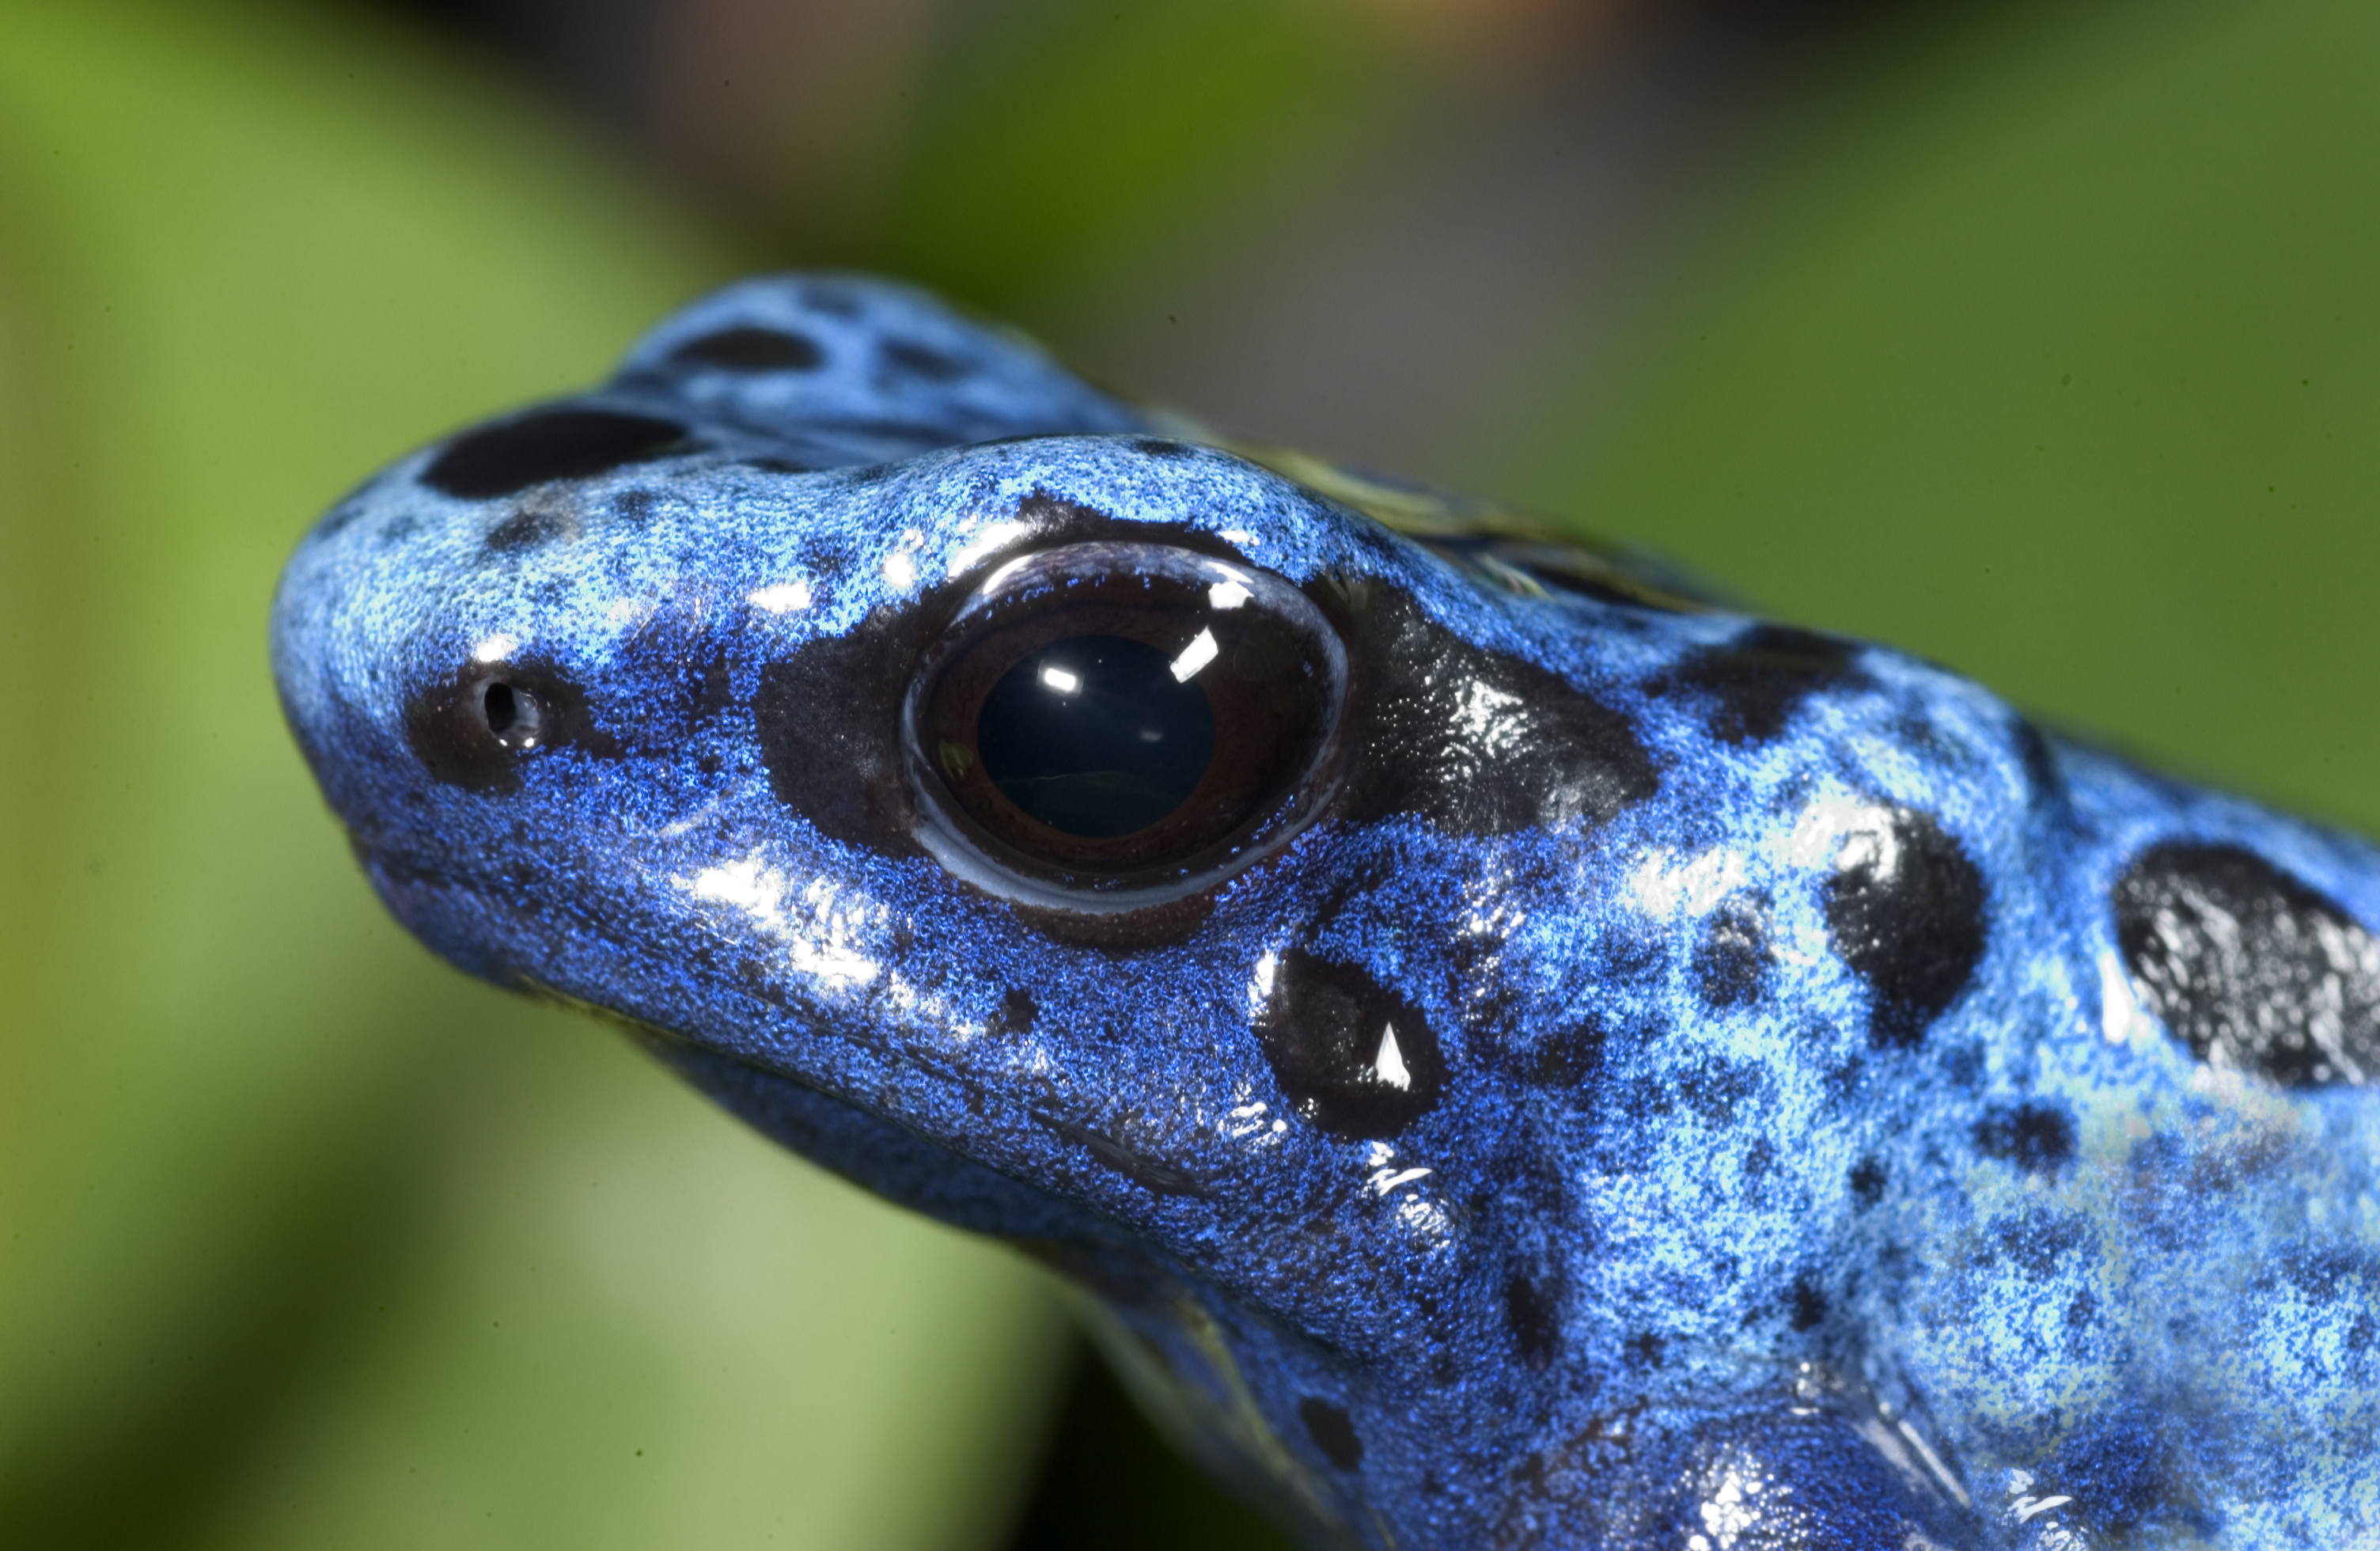 Poison Dart Frog Pics, Animal Collection